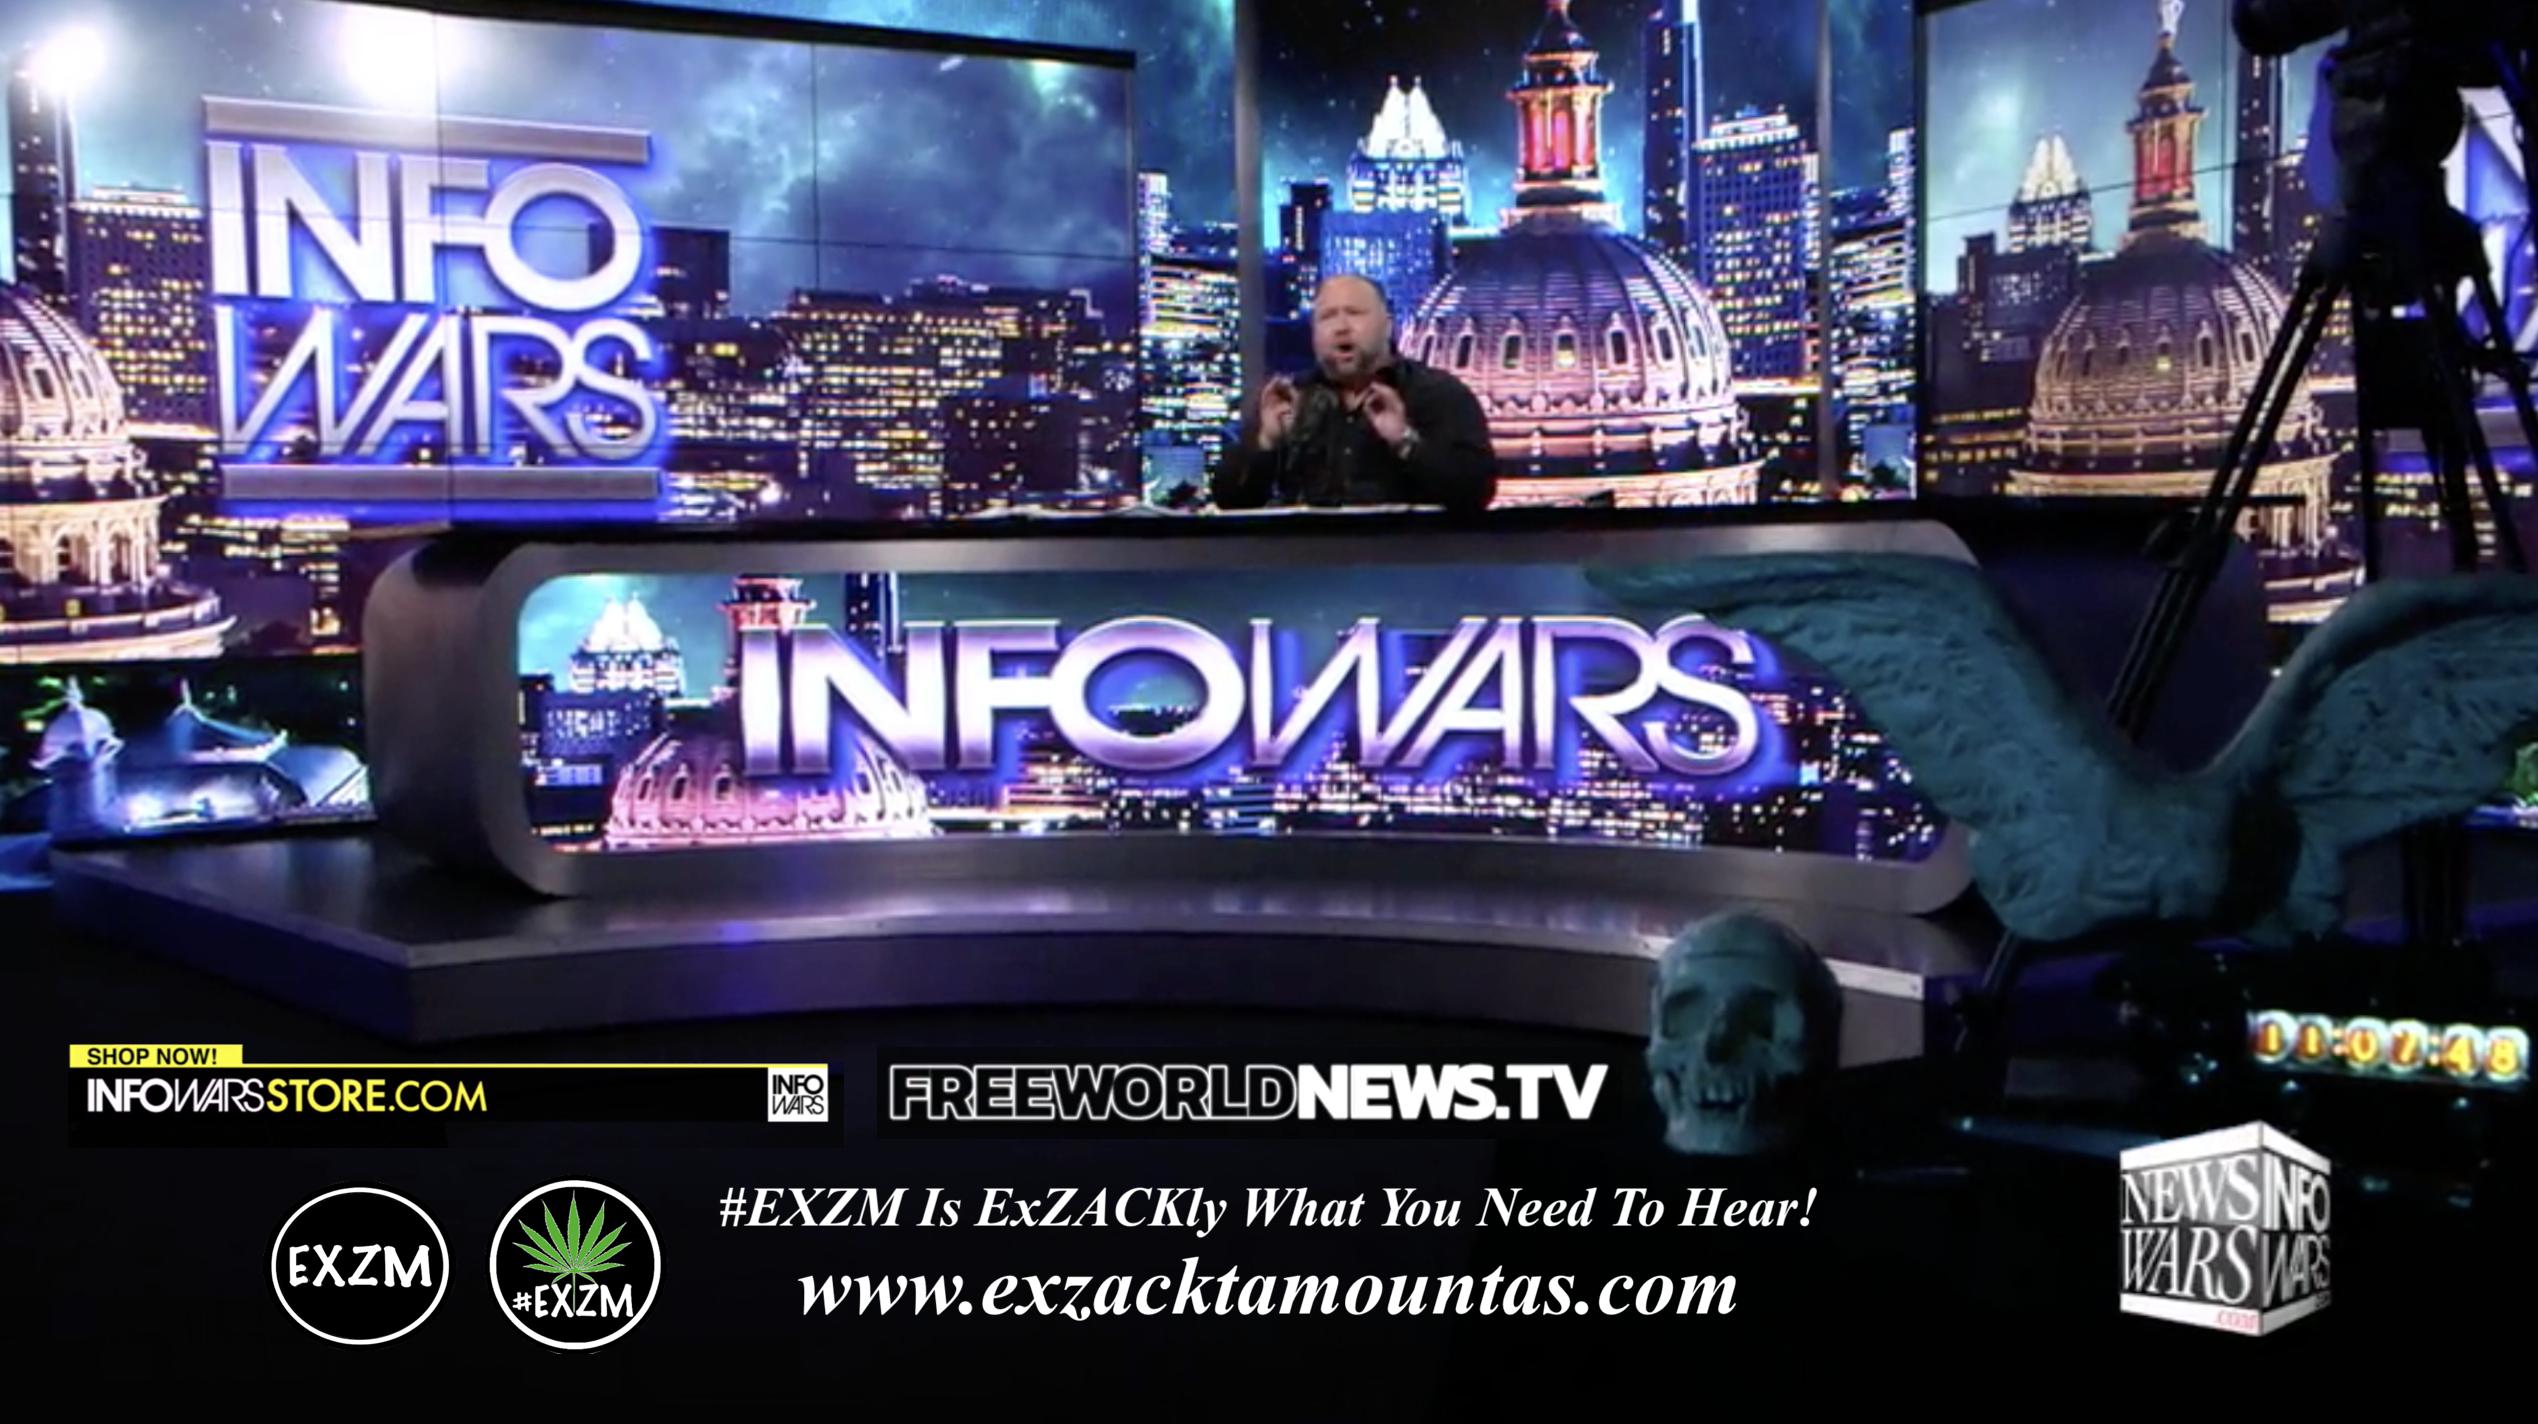 Alex Jones Live In Infowars Studio Free World News TV EXZM Zack Mount August 10th 2021 copy